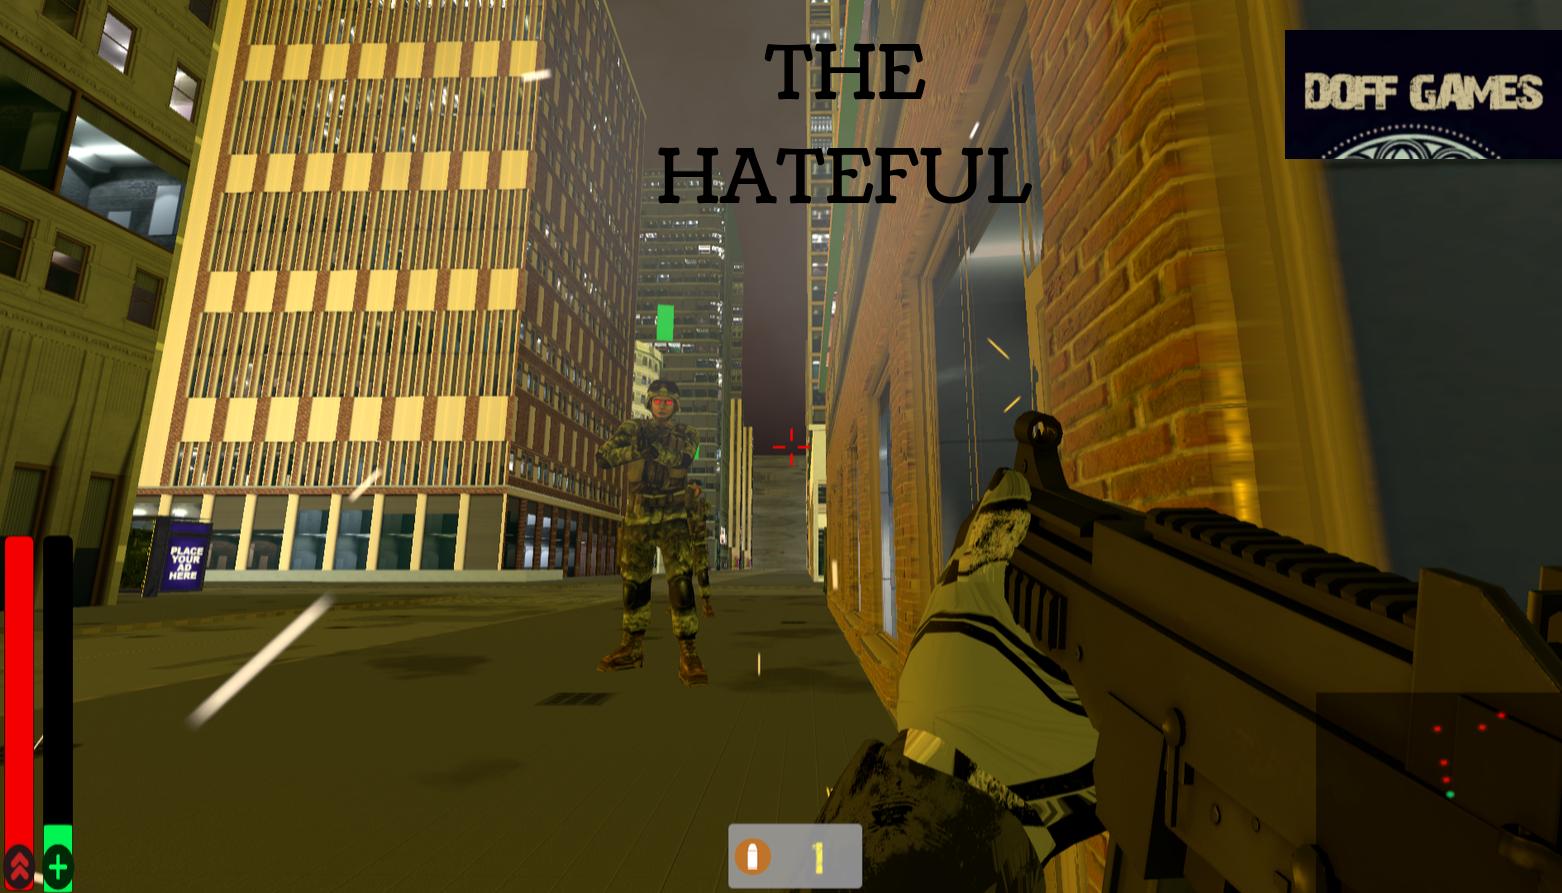 The Hateful.